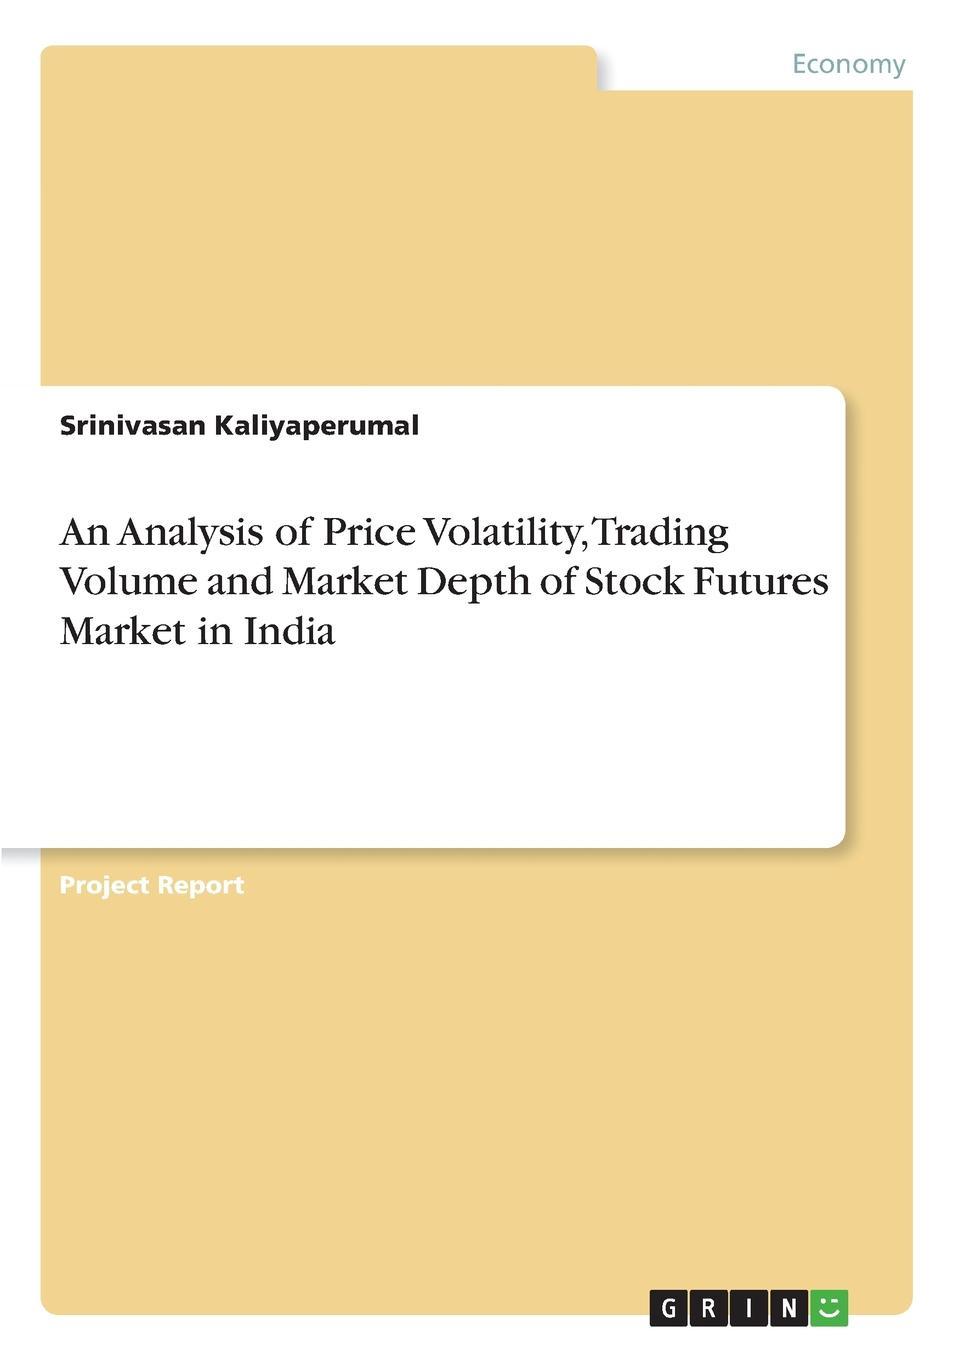 Srinivasan Kaliyaperumal An Analysis of Price Volatility, Trading Volume and Market Depth of Stock Futures Market in India financial english